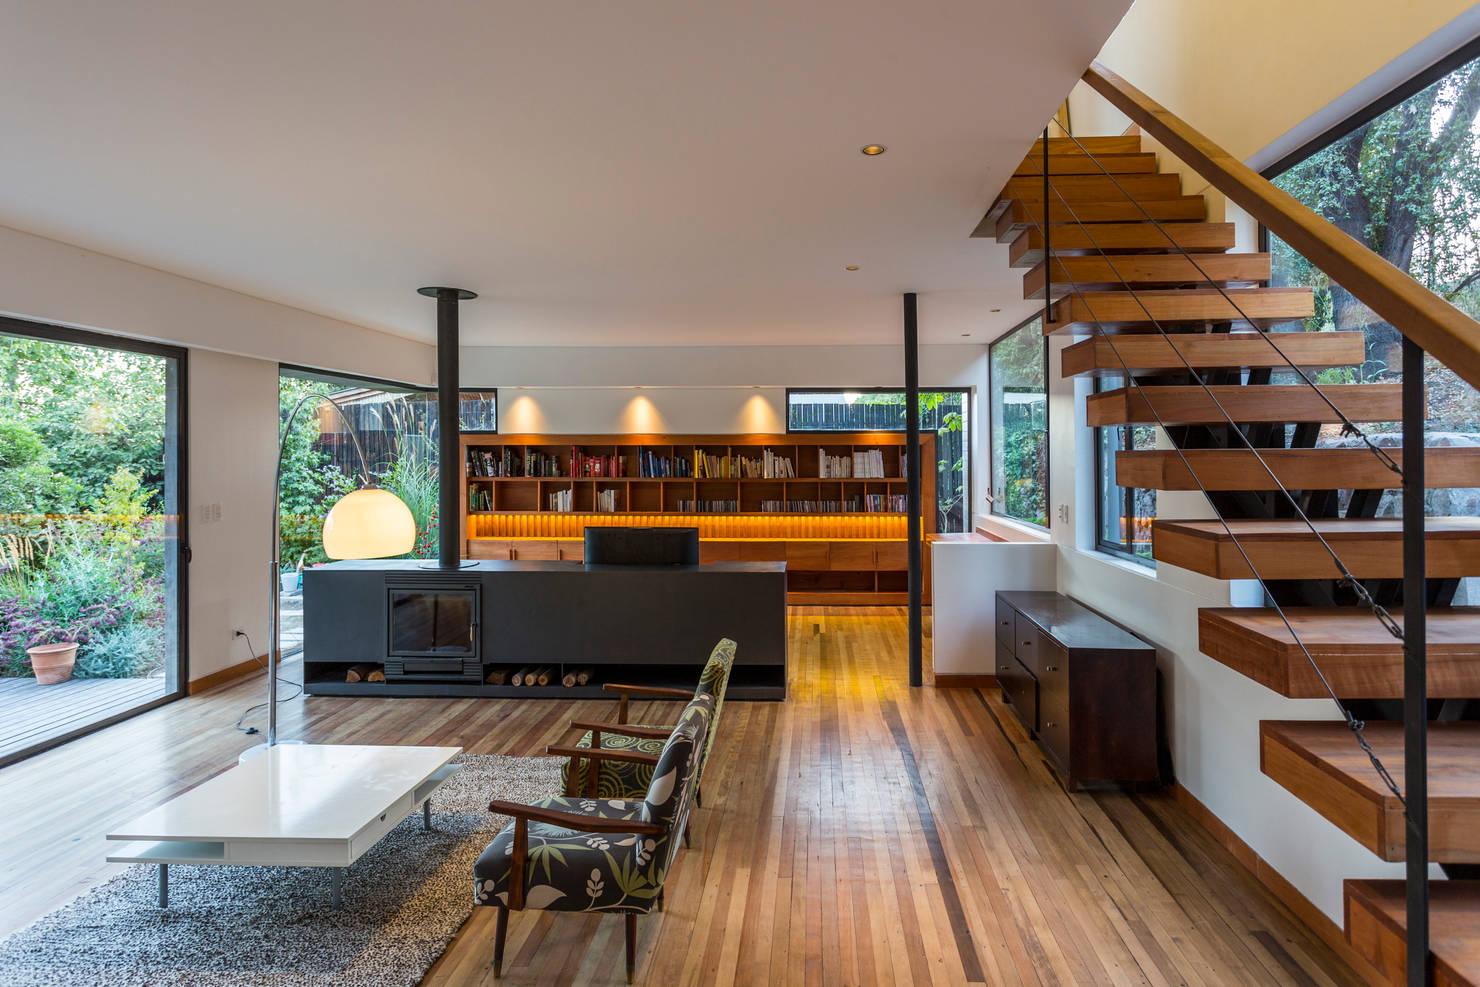 Diseño de casas e interiores exclusivos en Santiago